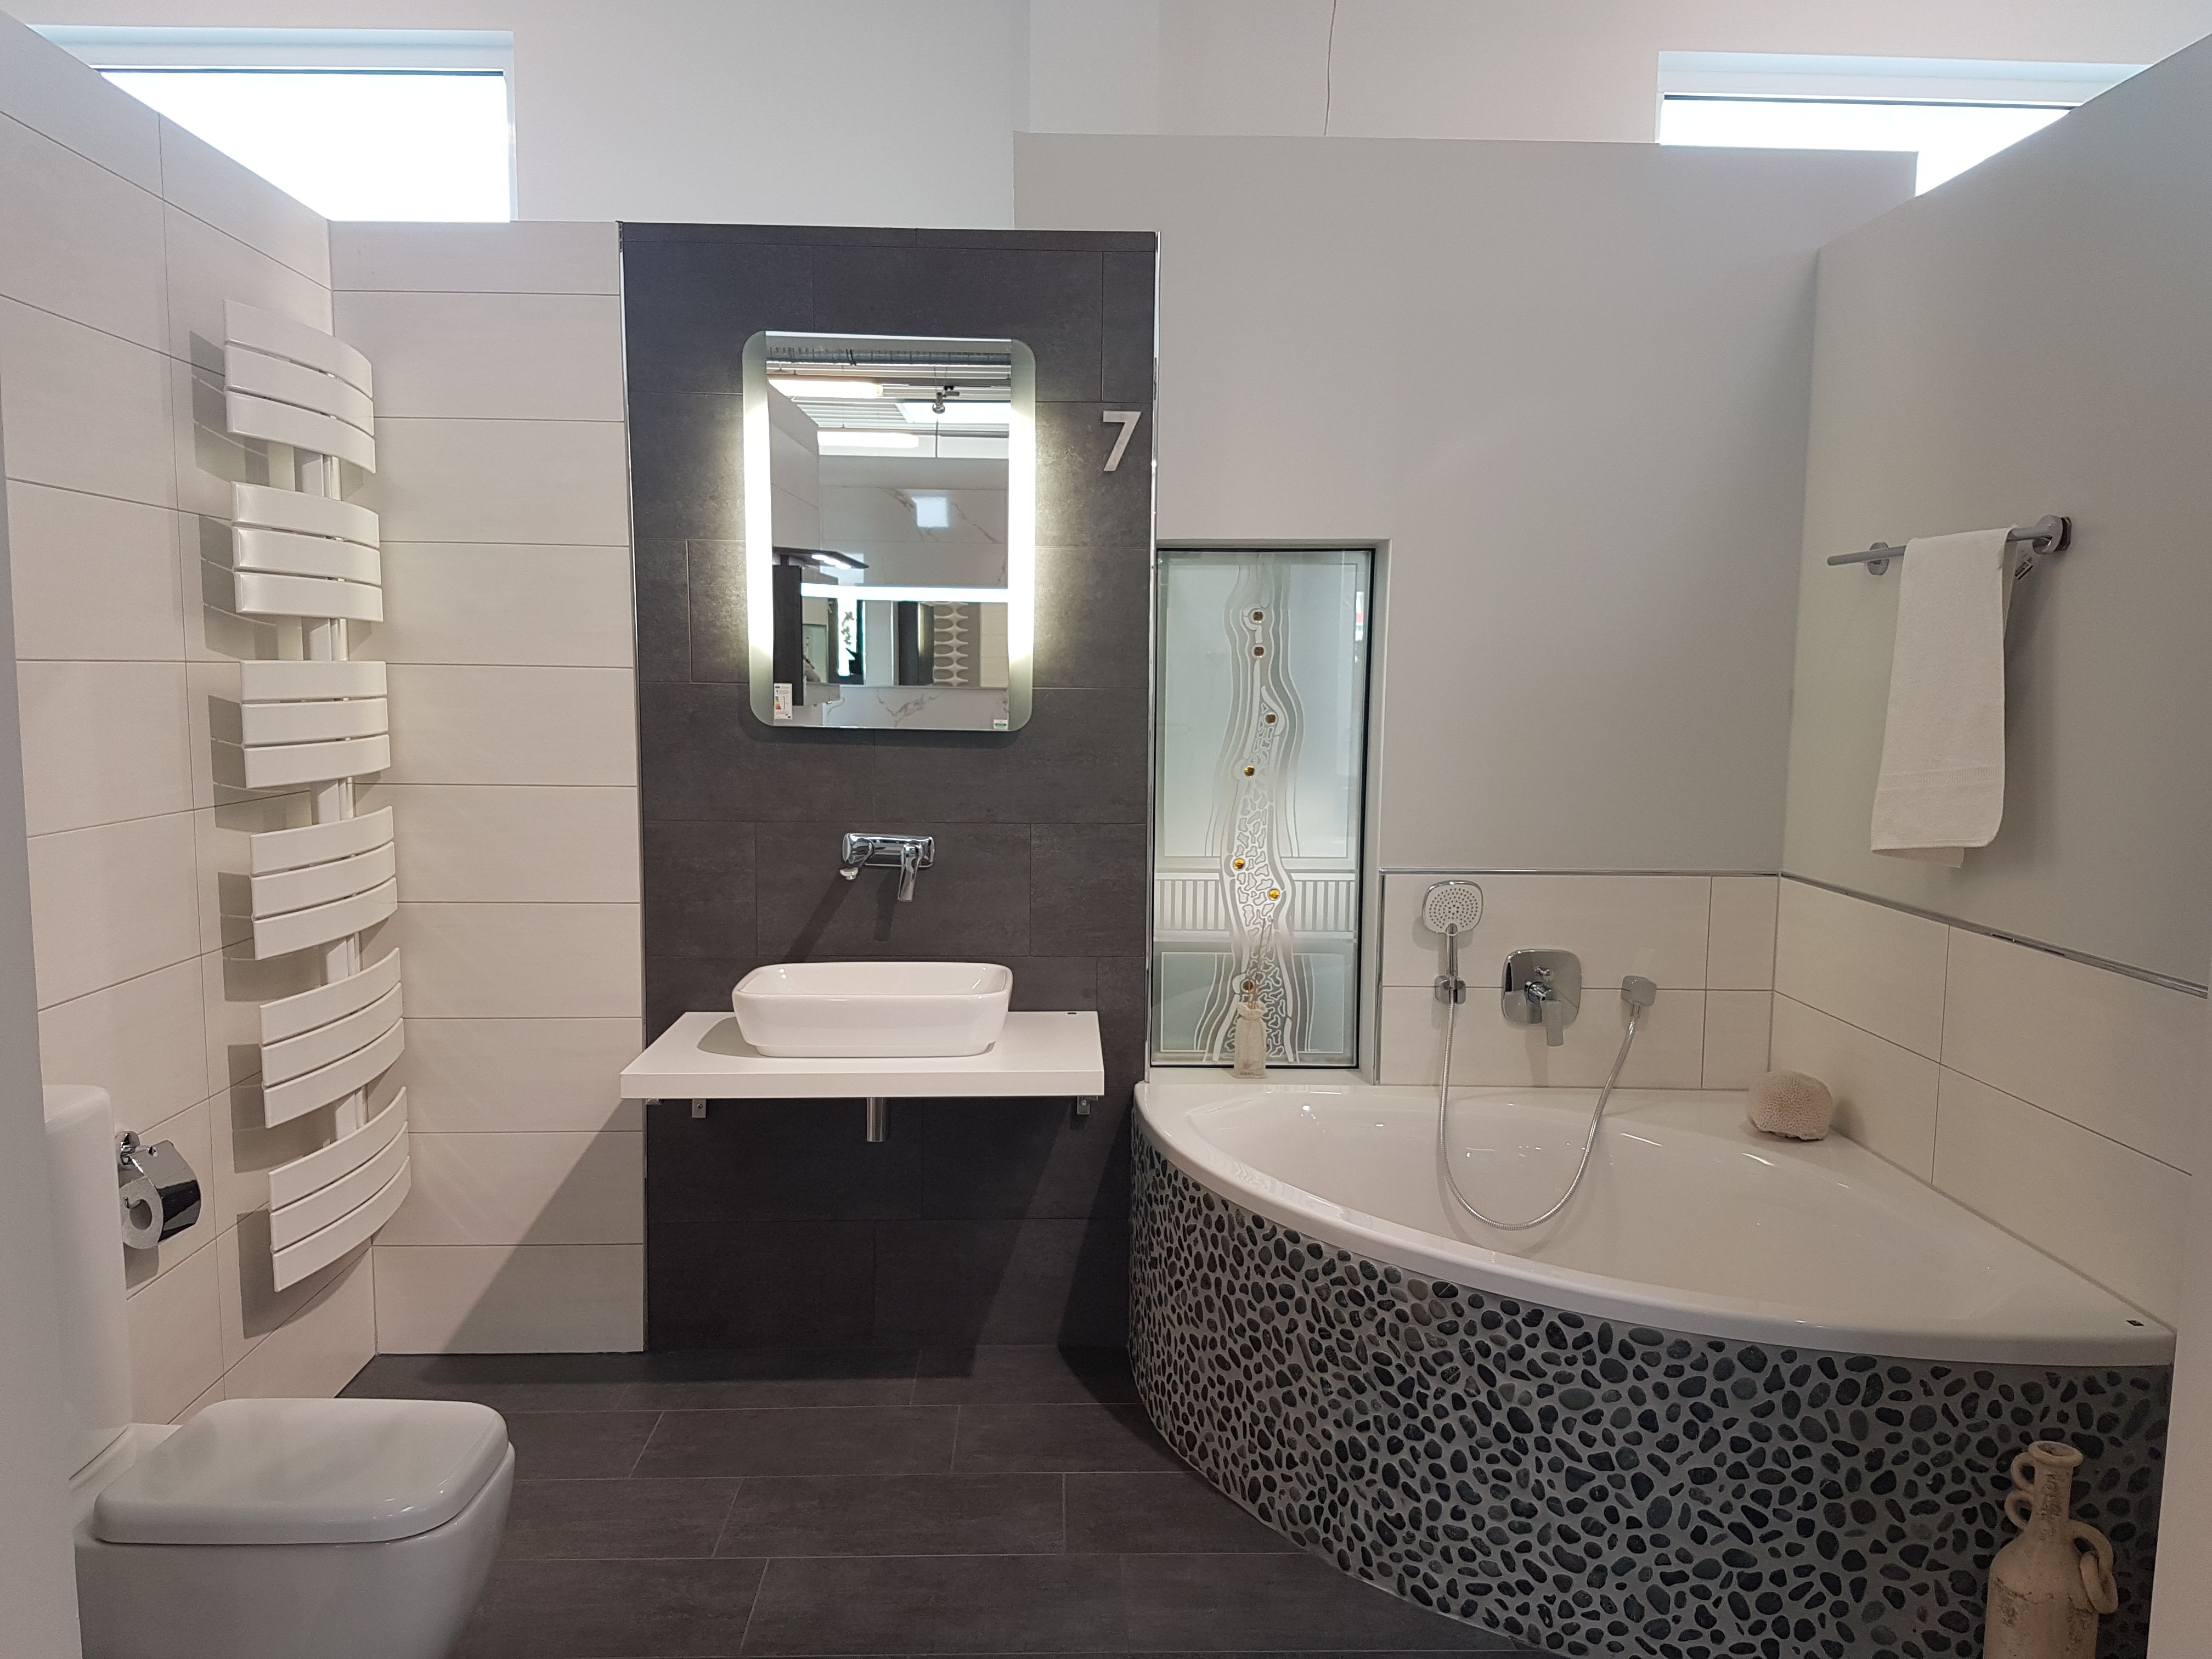 Eckbadewanne Kiesel Mosaik Hangende Toilette Bad Eckbadewanne Baden Bad Mosaik